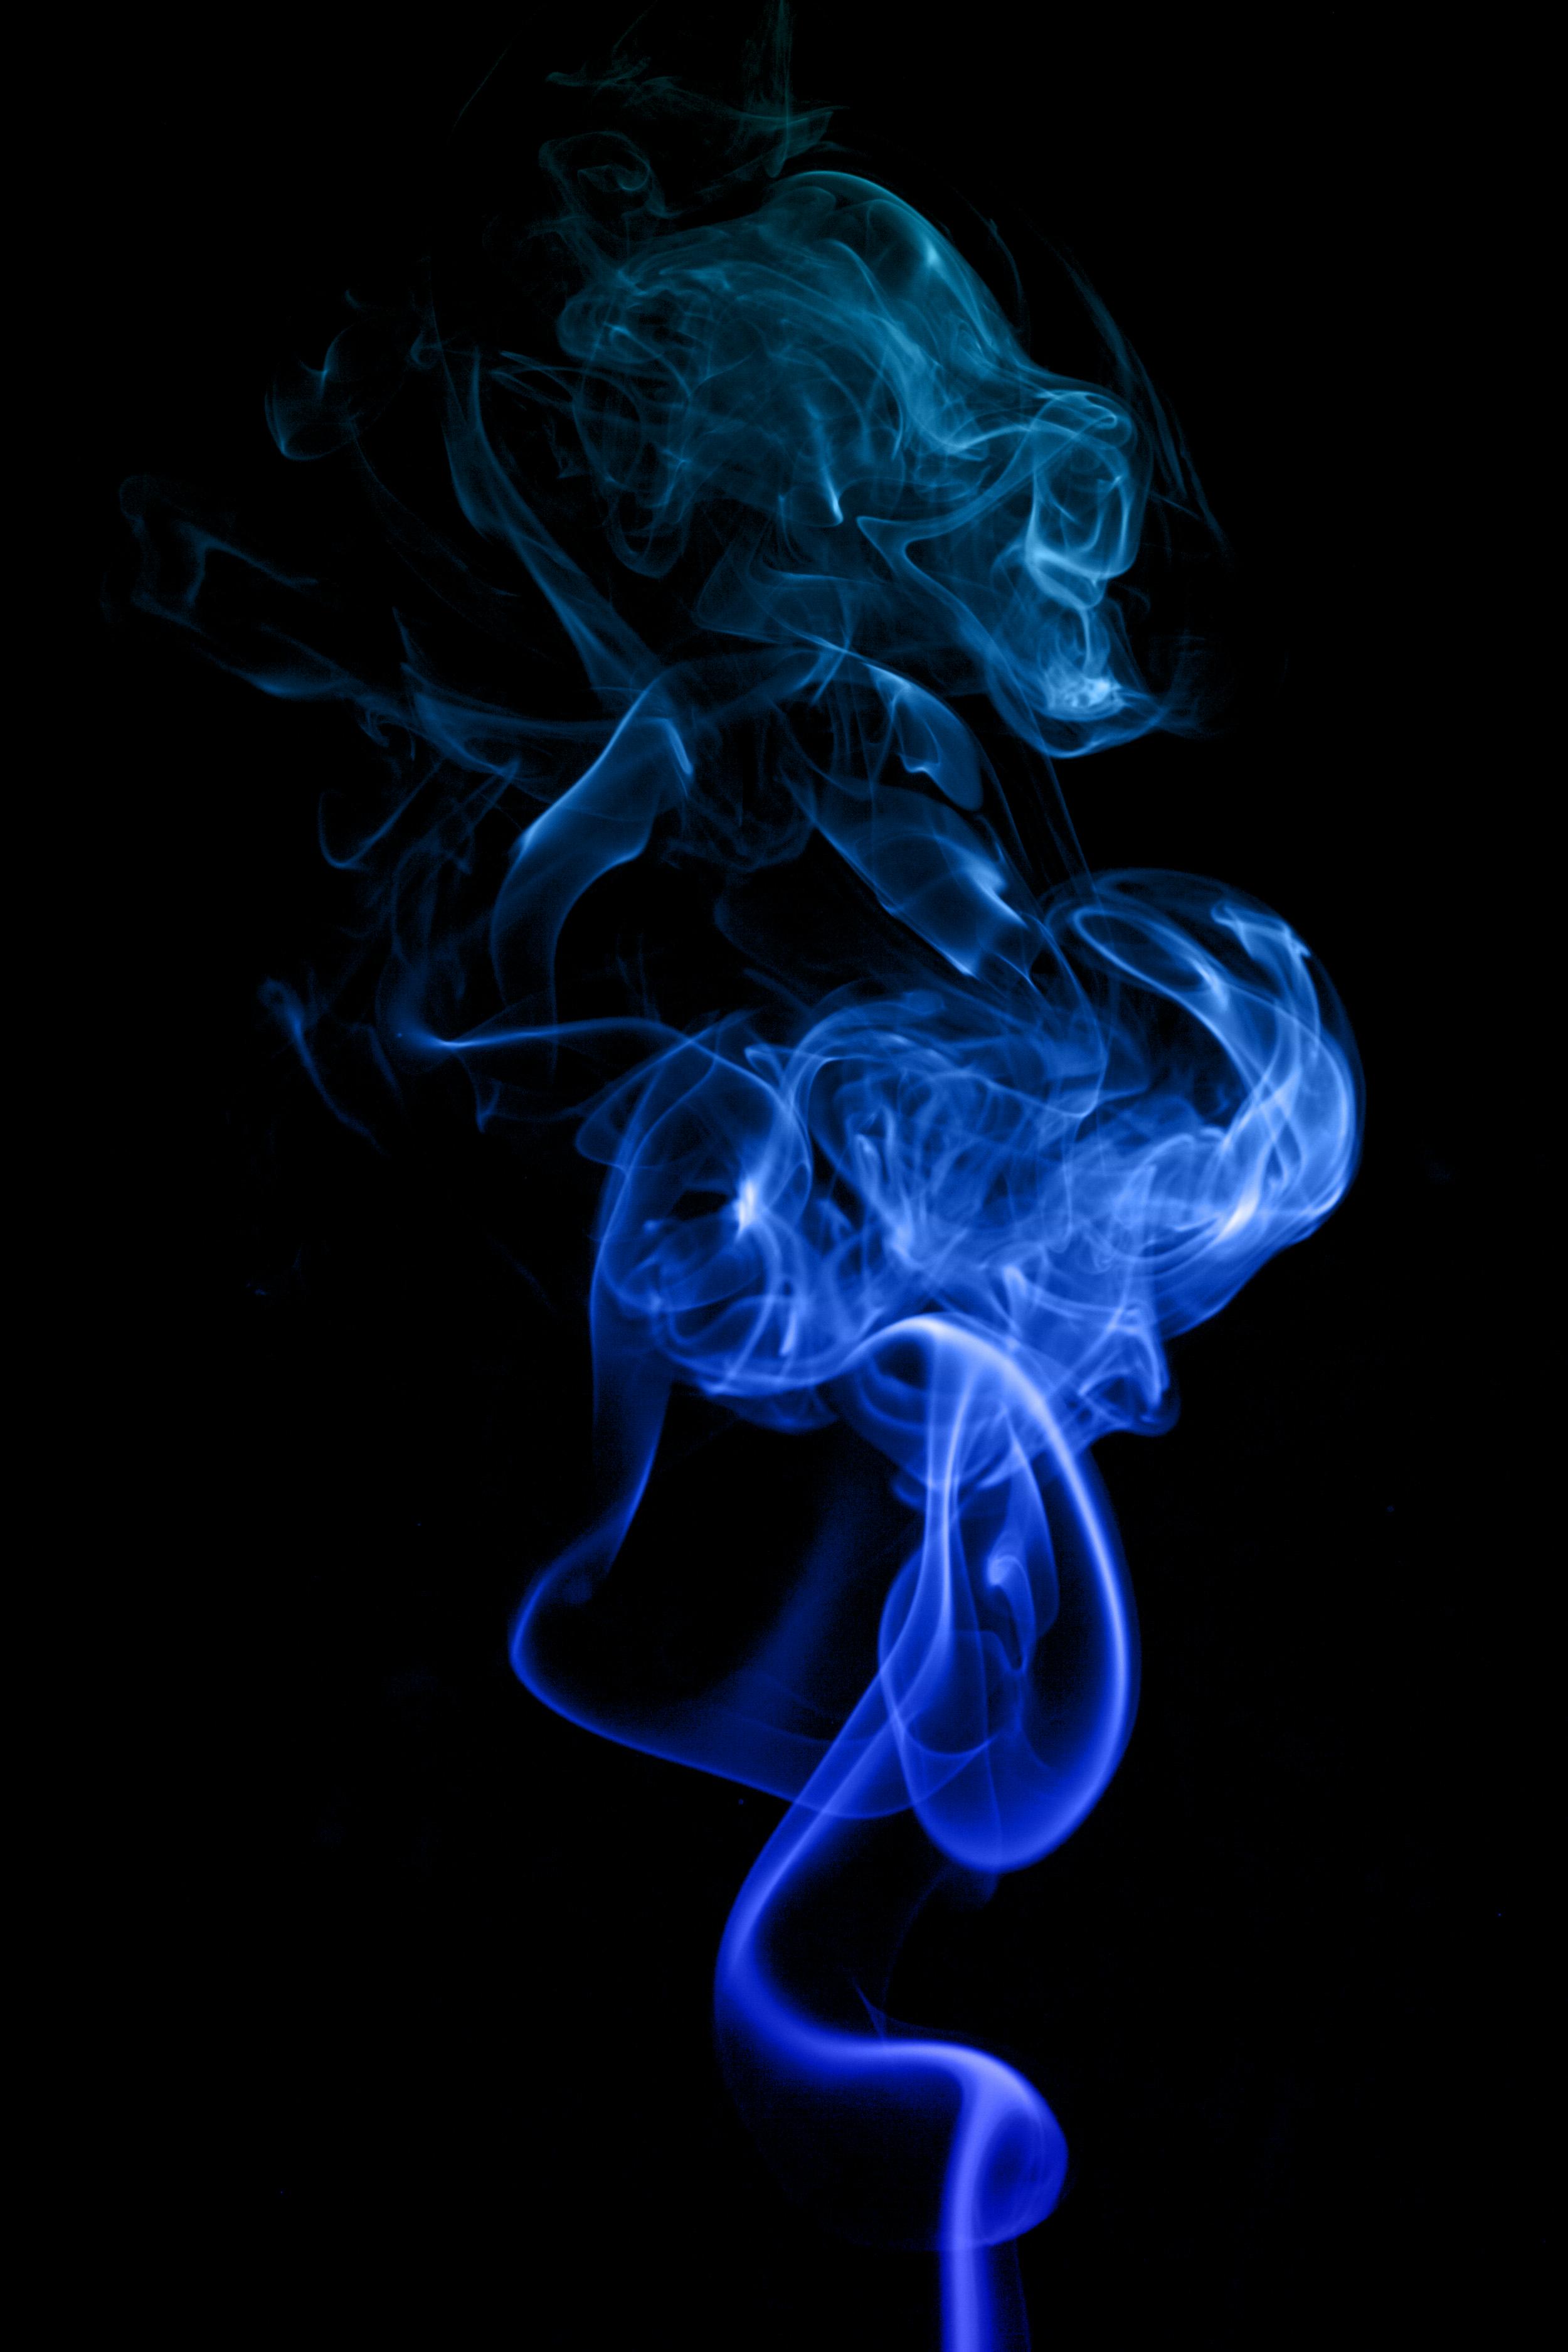 Popular Wallpaper Night Dragon - blue_dragon_smoke_art_by_black_night_shade-d5ygvtf  Photograph.jpg